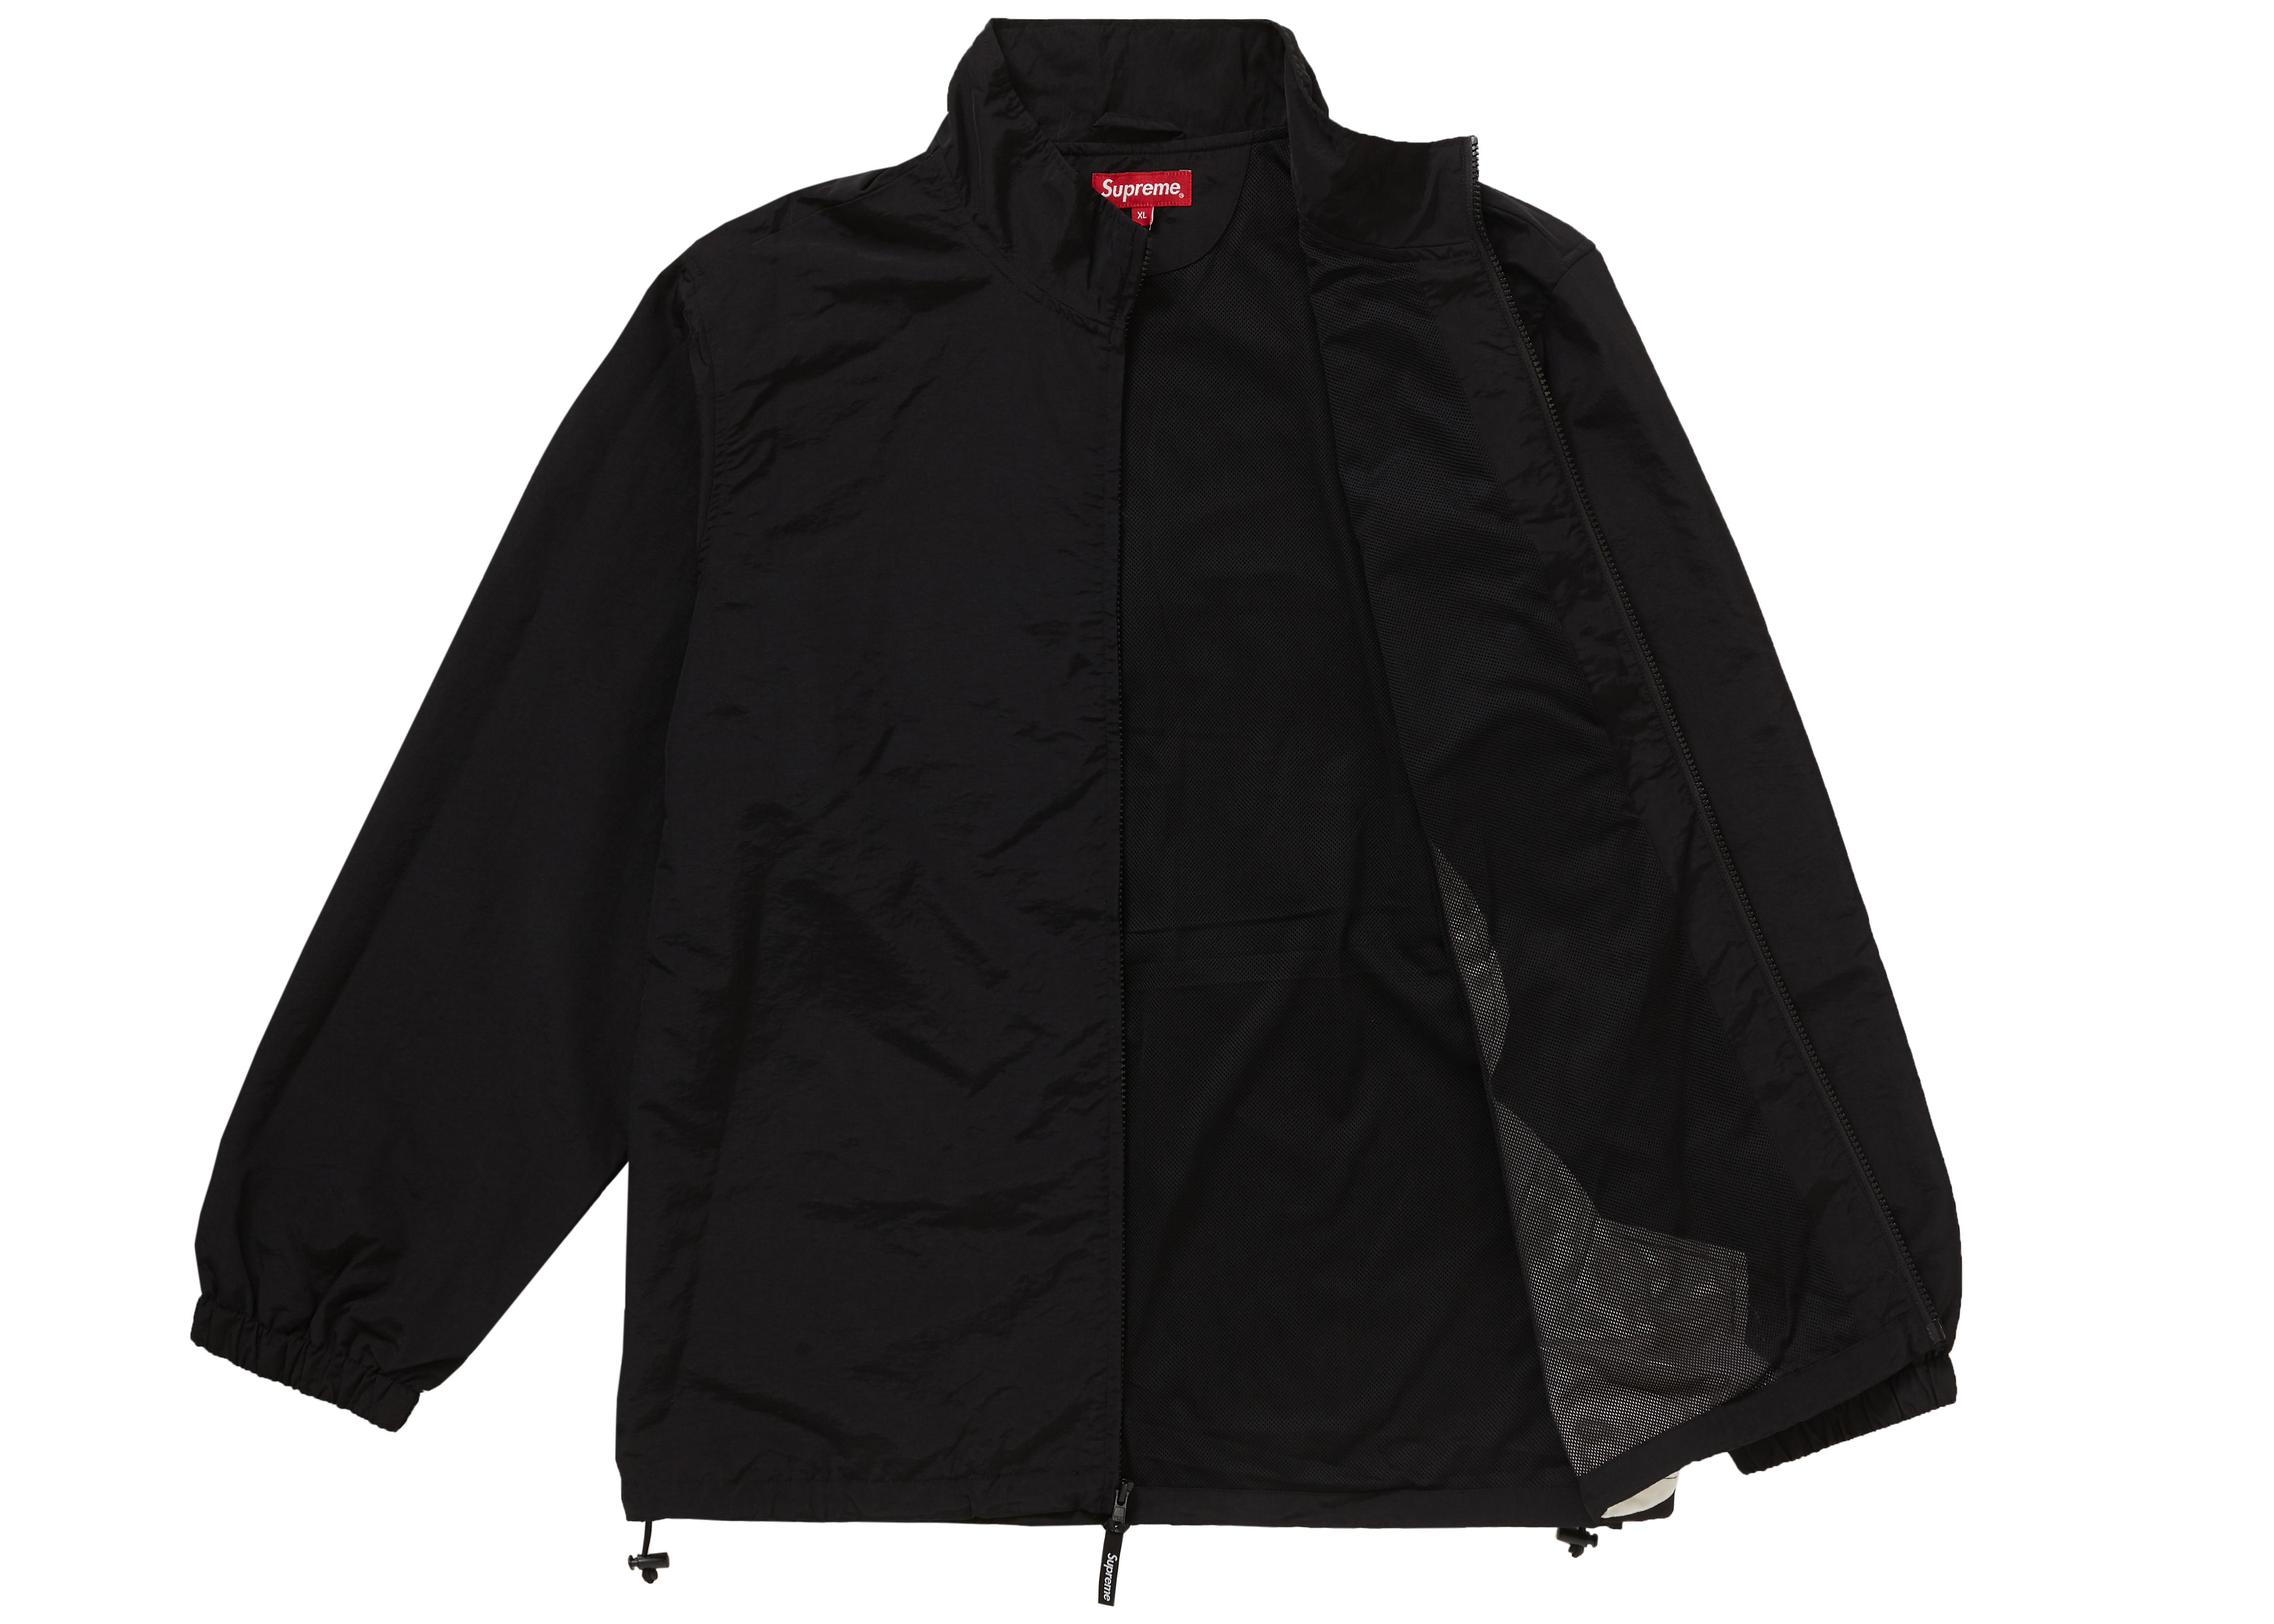 Supreme Streetwear Buyamp; Sell Most Popular uKlJc3F15T